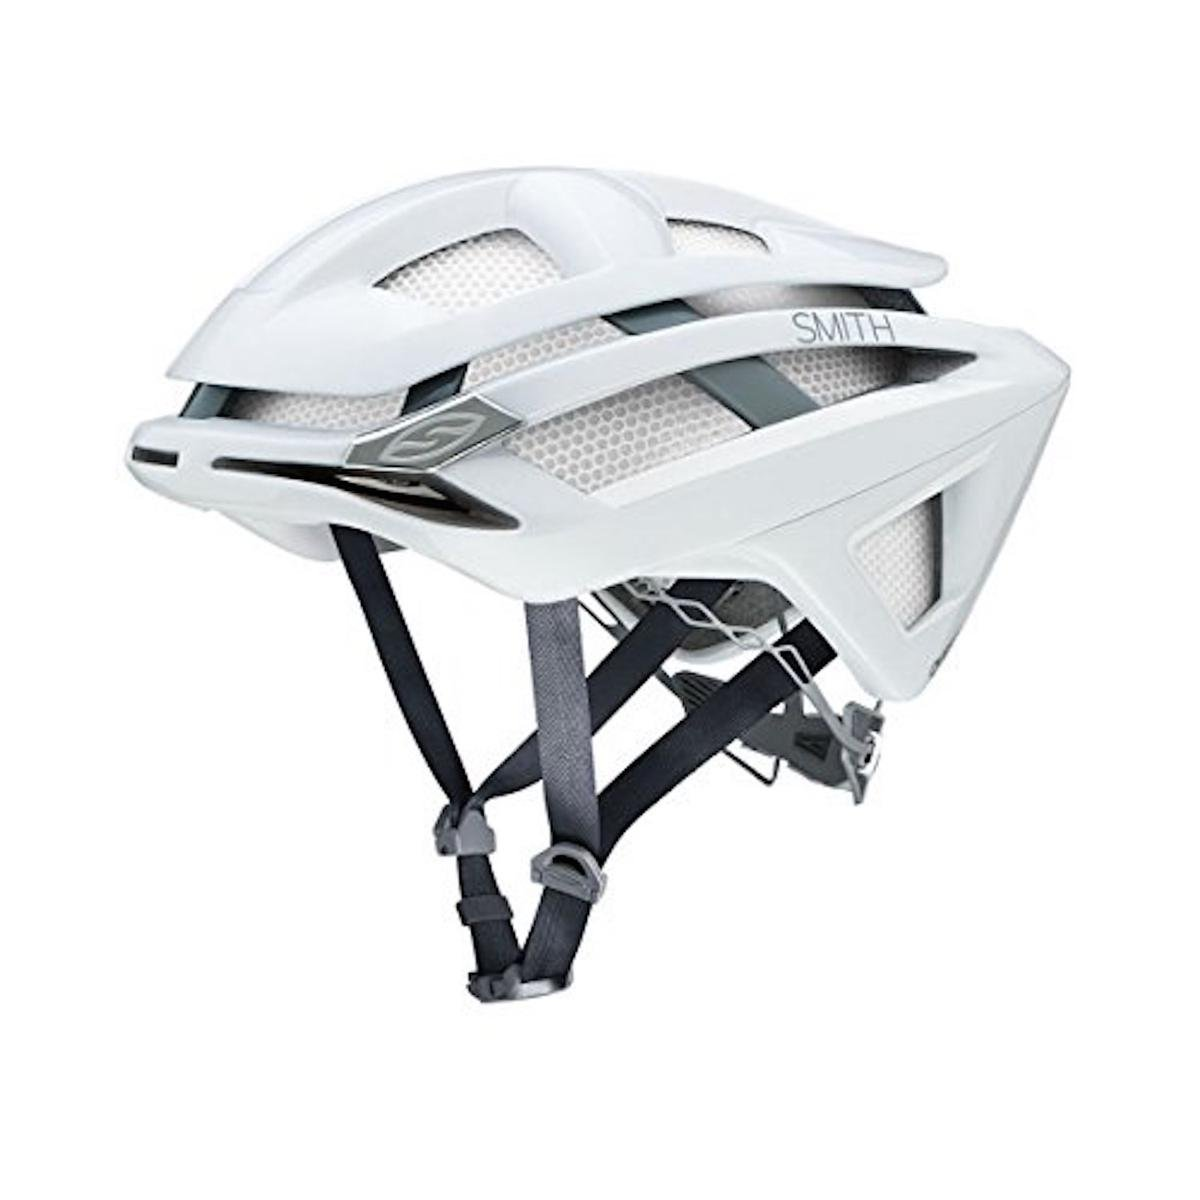 Smith Overtake Helmet White, L